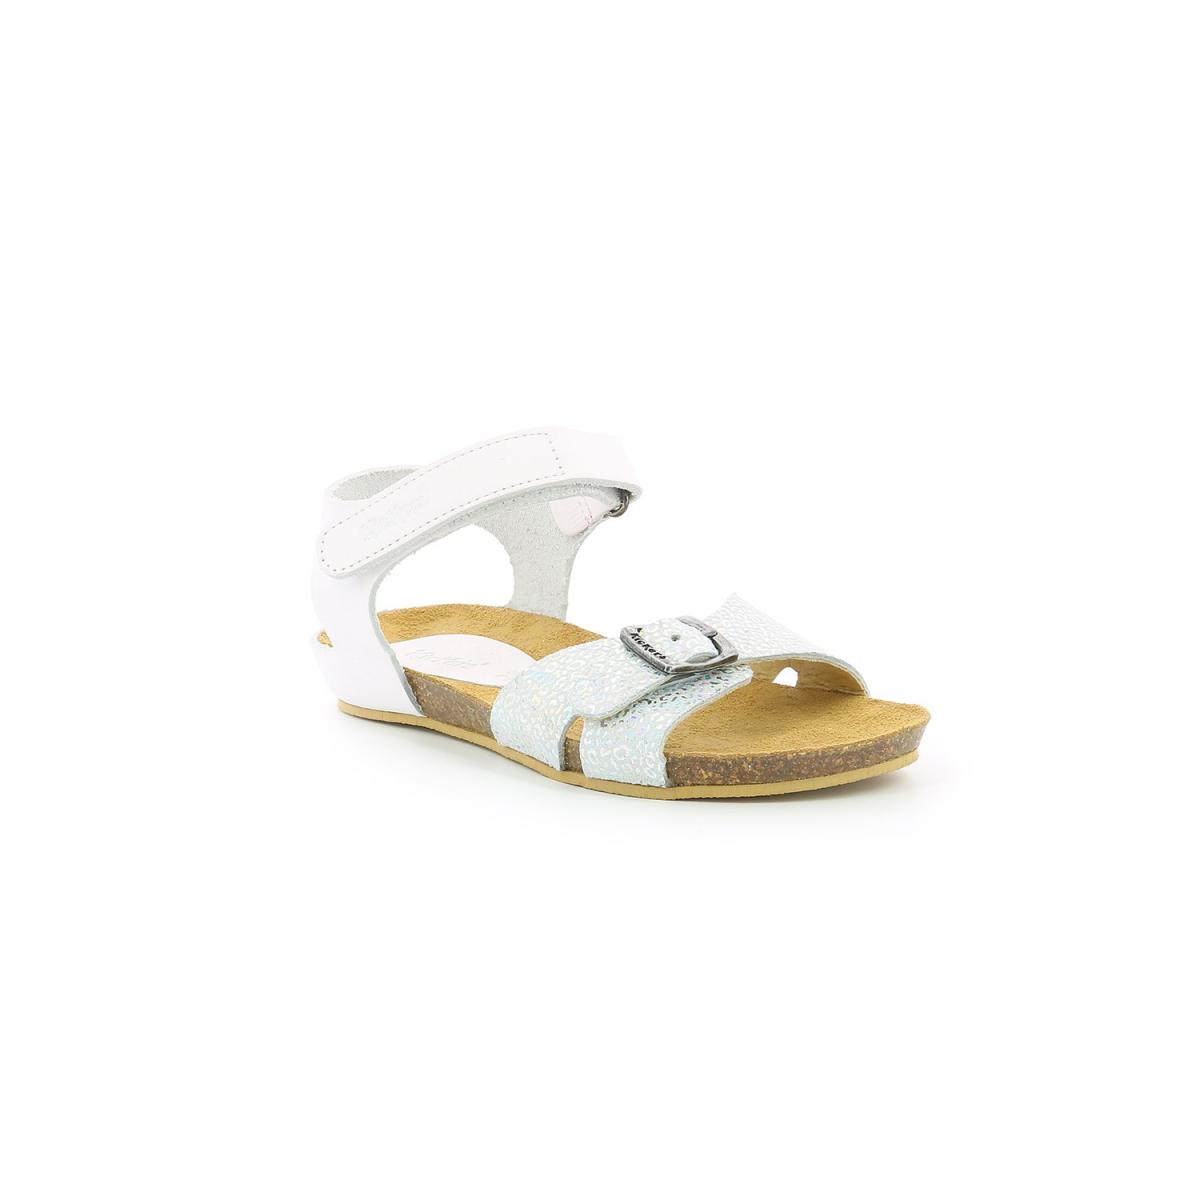 Chaussures Enfant BOBBUN BLANC Kickers